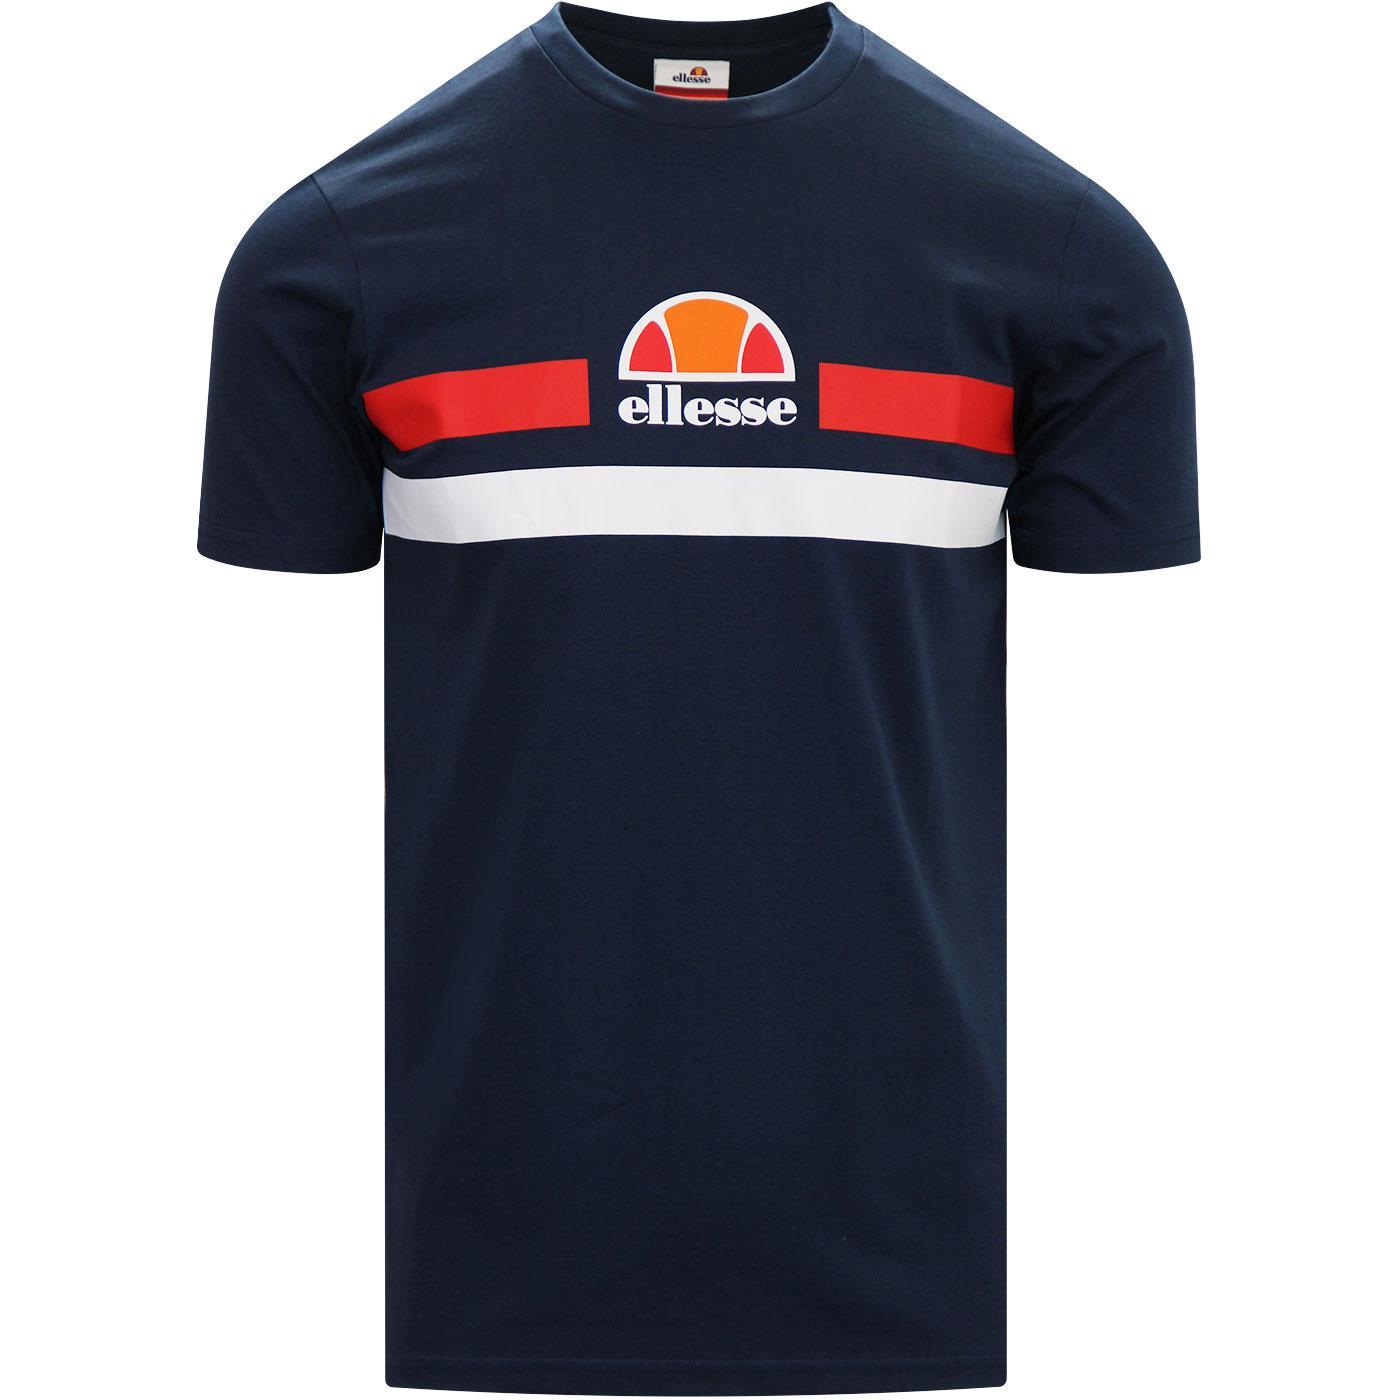 Aprel ELLESSE Retro Chest Stripe Logo T-shirt N